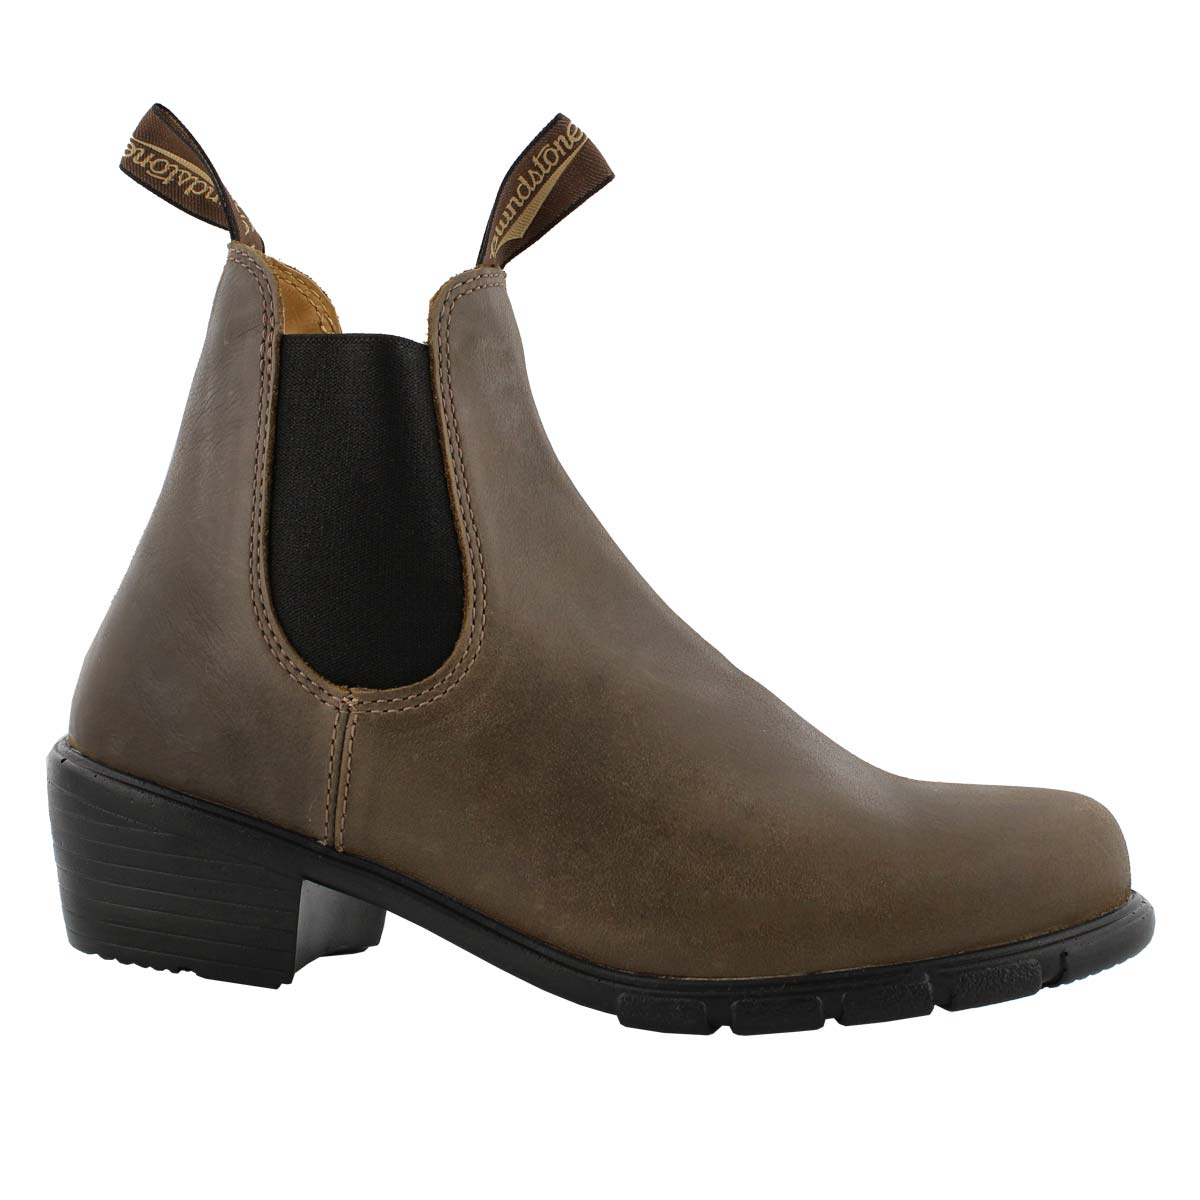 Lds block heel taupe pullon chelsea boot